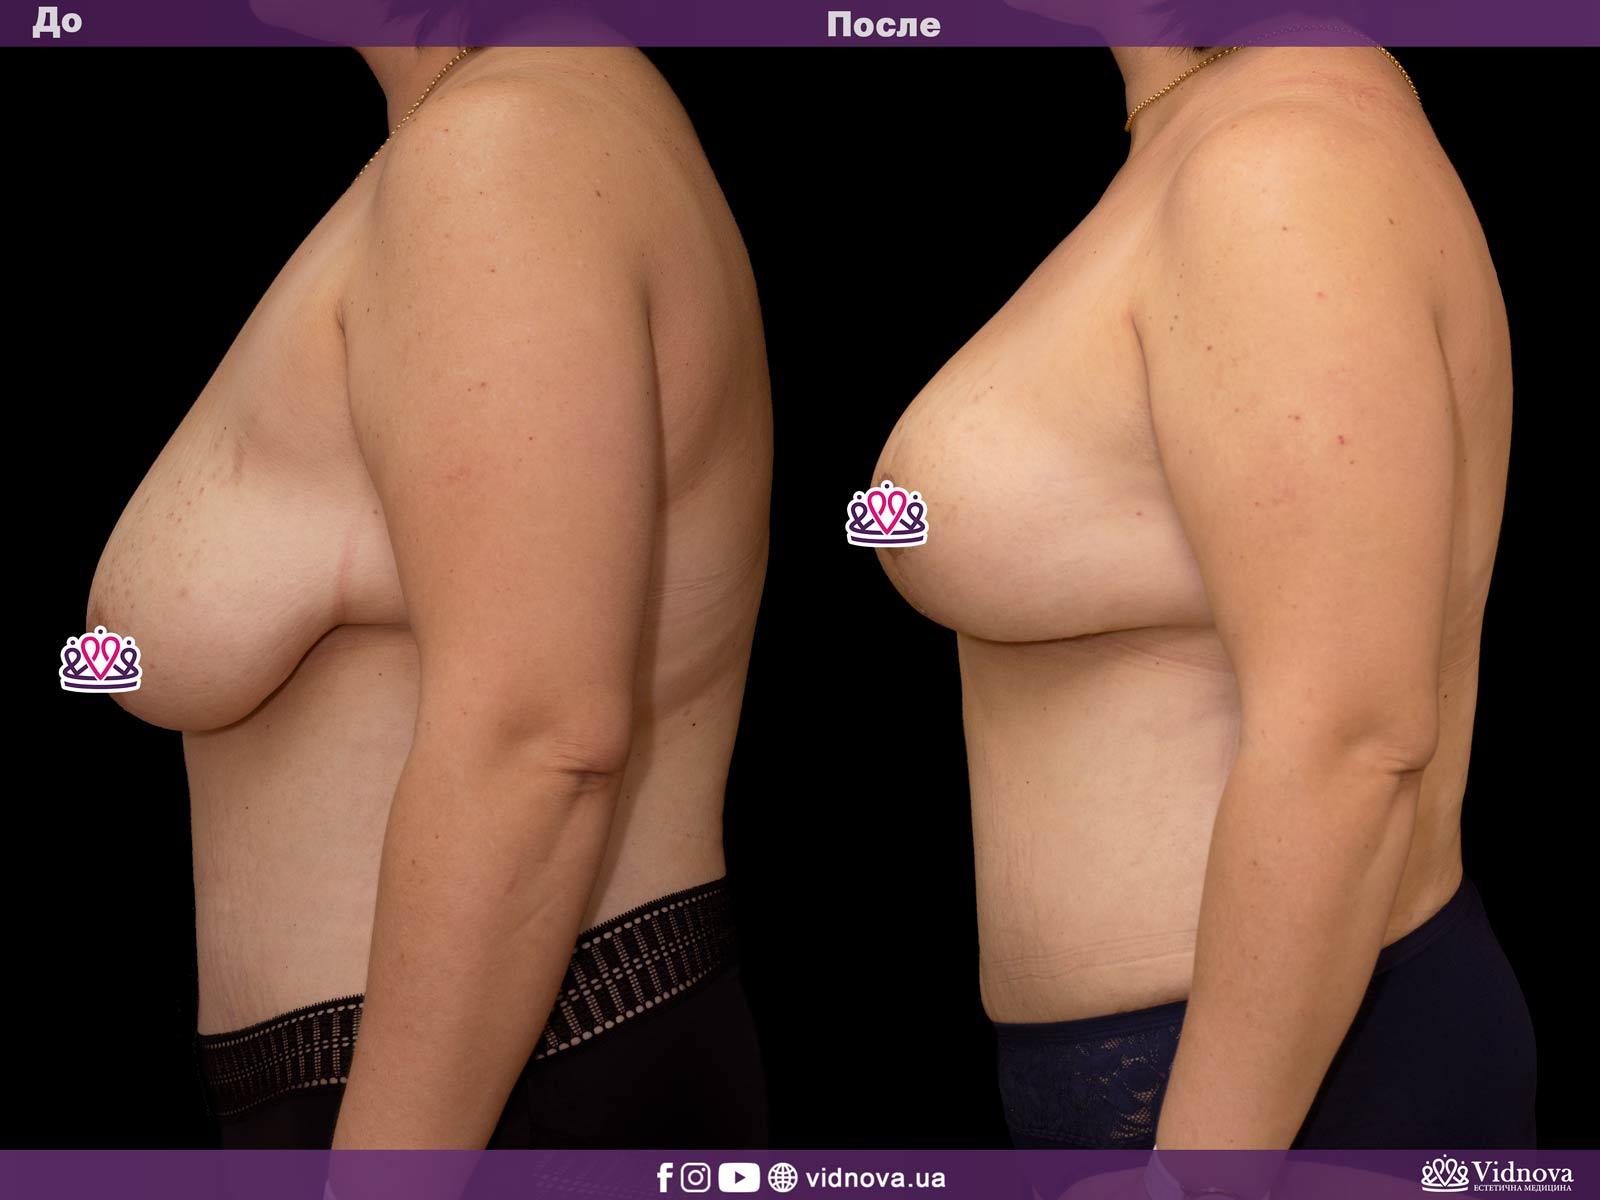 Подтяжка груди: Фото ДО и ПОСЛЕ - Пример №18-3 - Клиника Vidnova